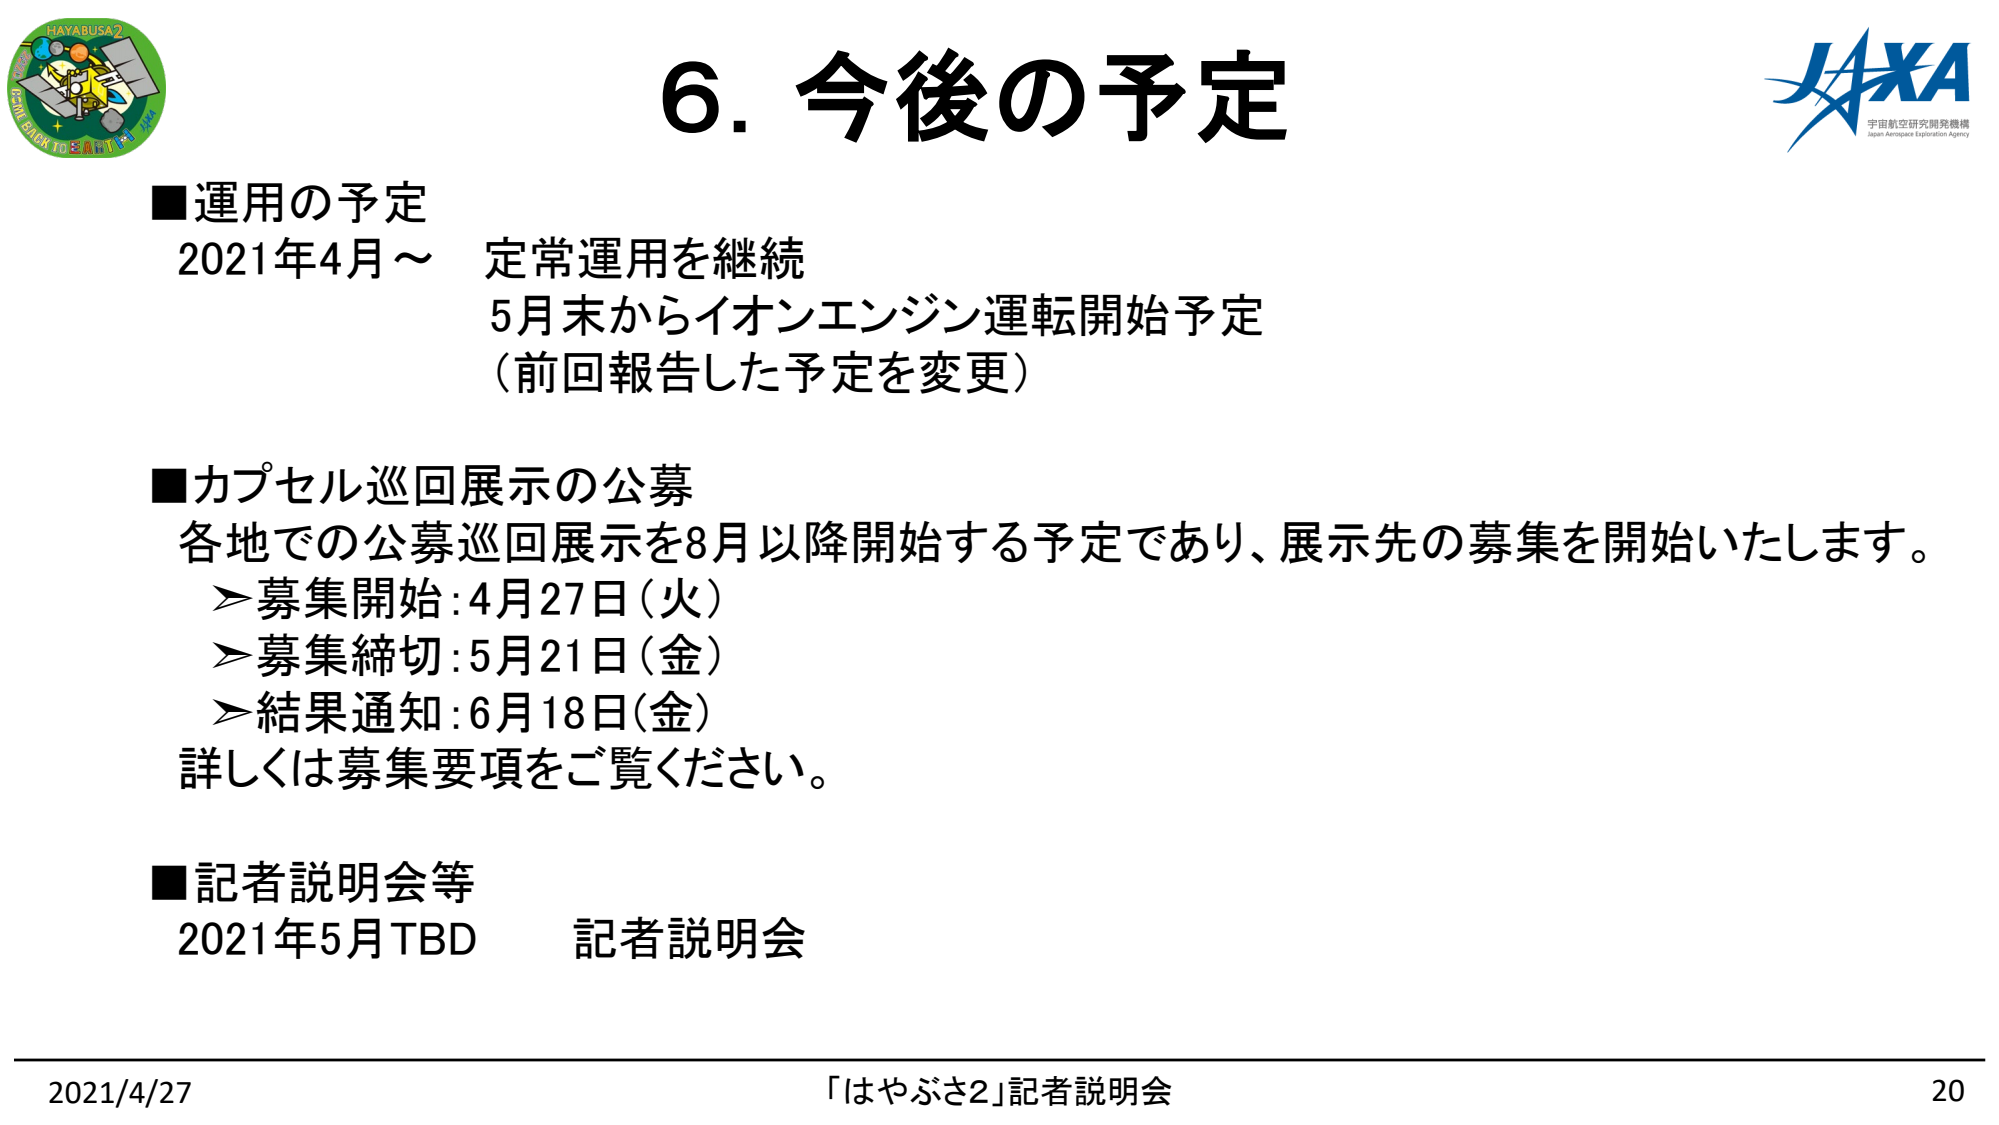 f:id:Imamura:20210427135307p:plain